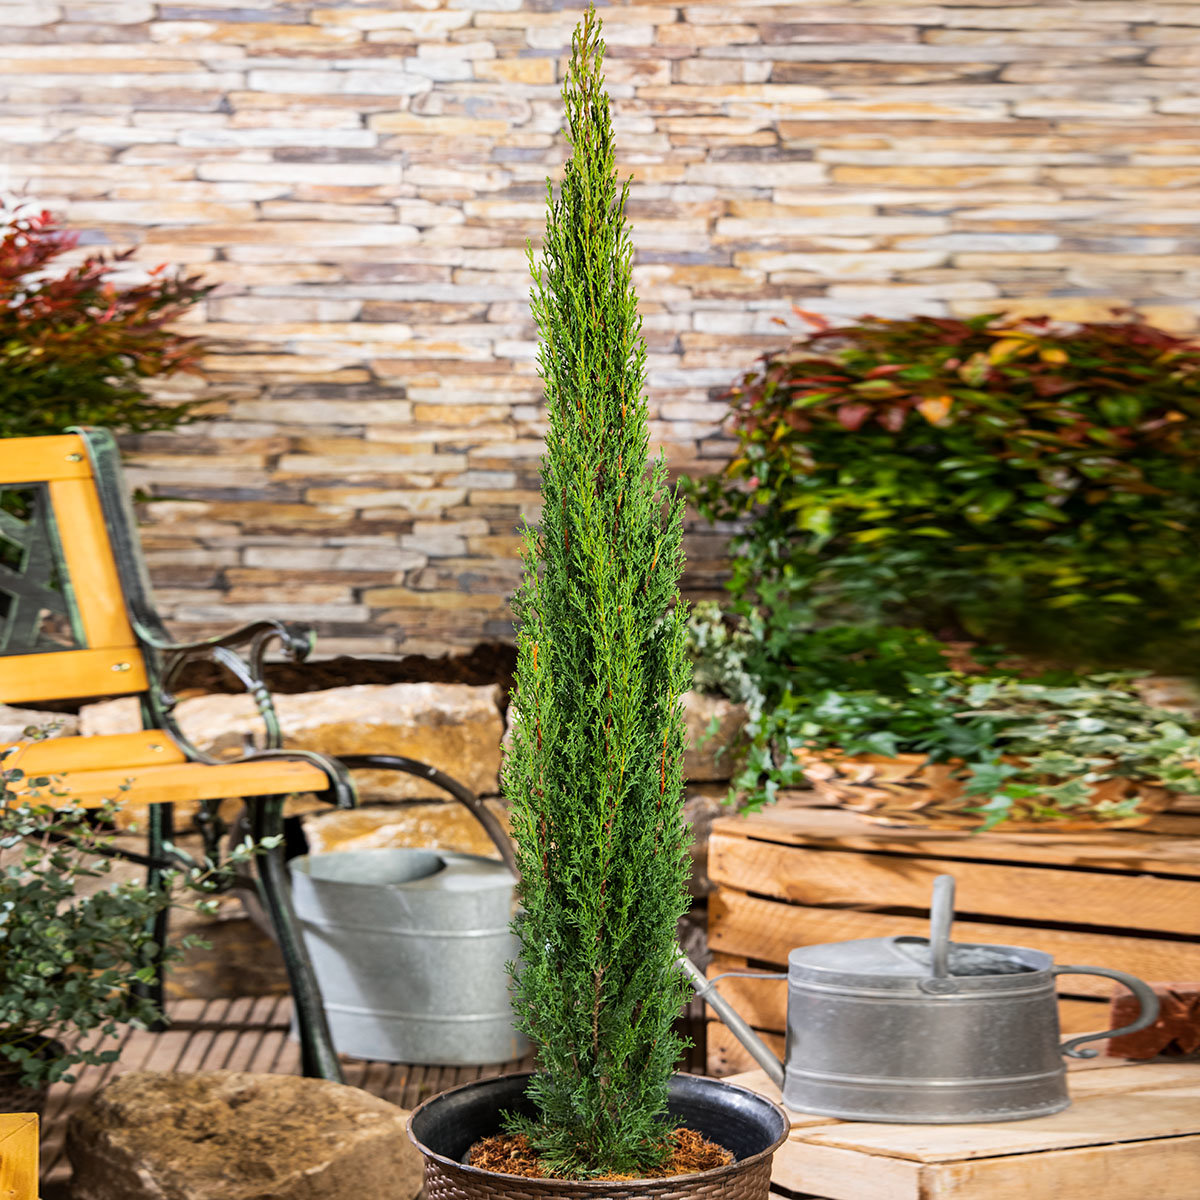 Mittelmeerzypresse, im ca. 26 cm-Topf